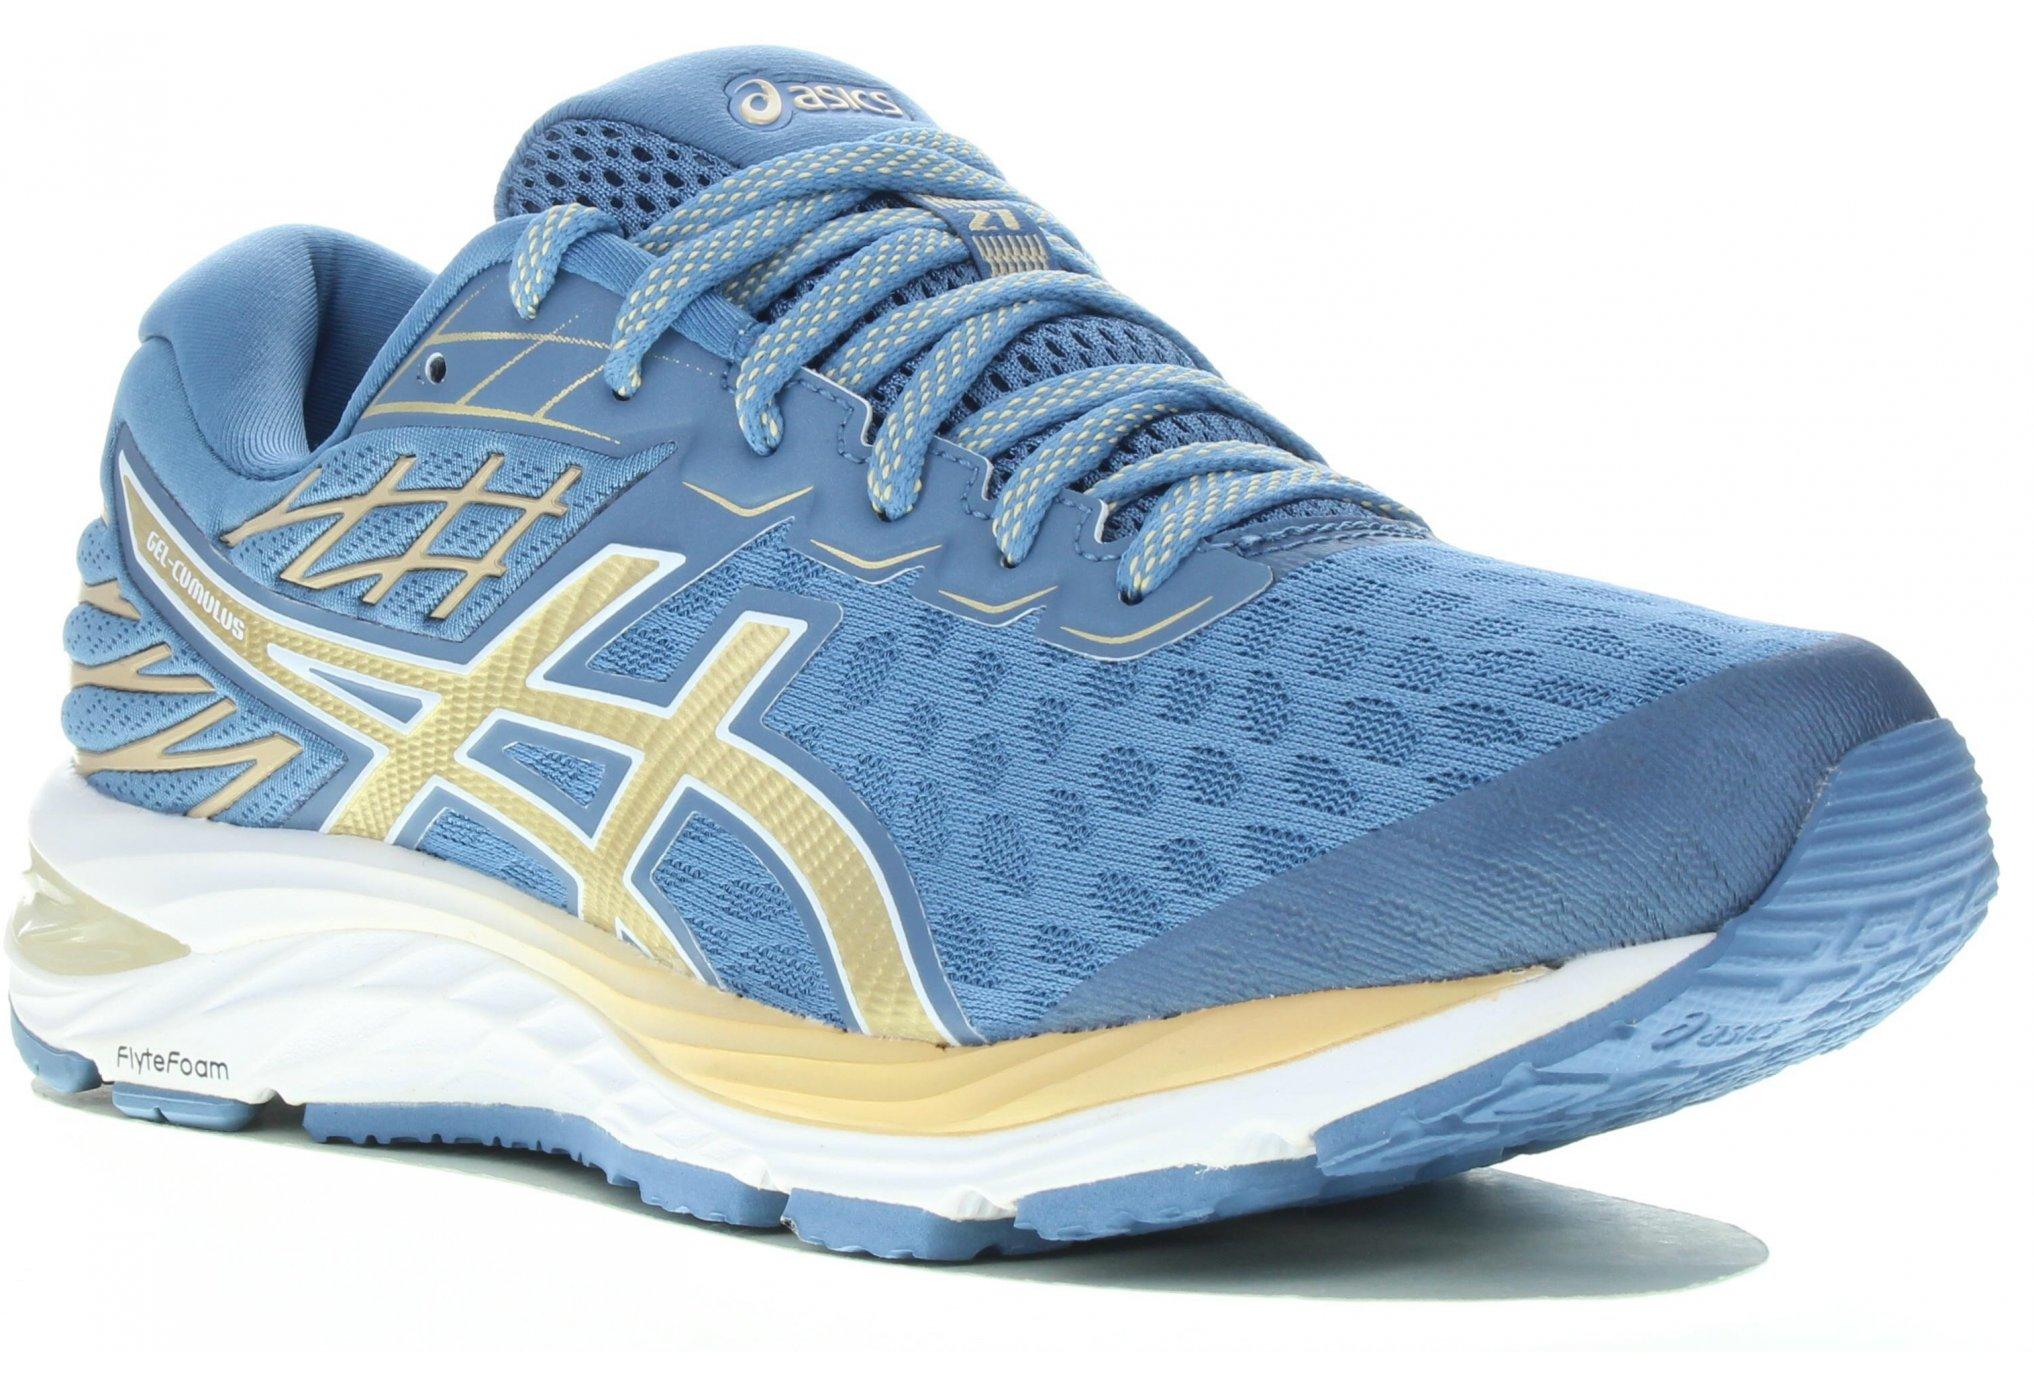 Asics Gel-Cumulus 21 The New Strong Chaussures running femme